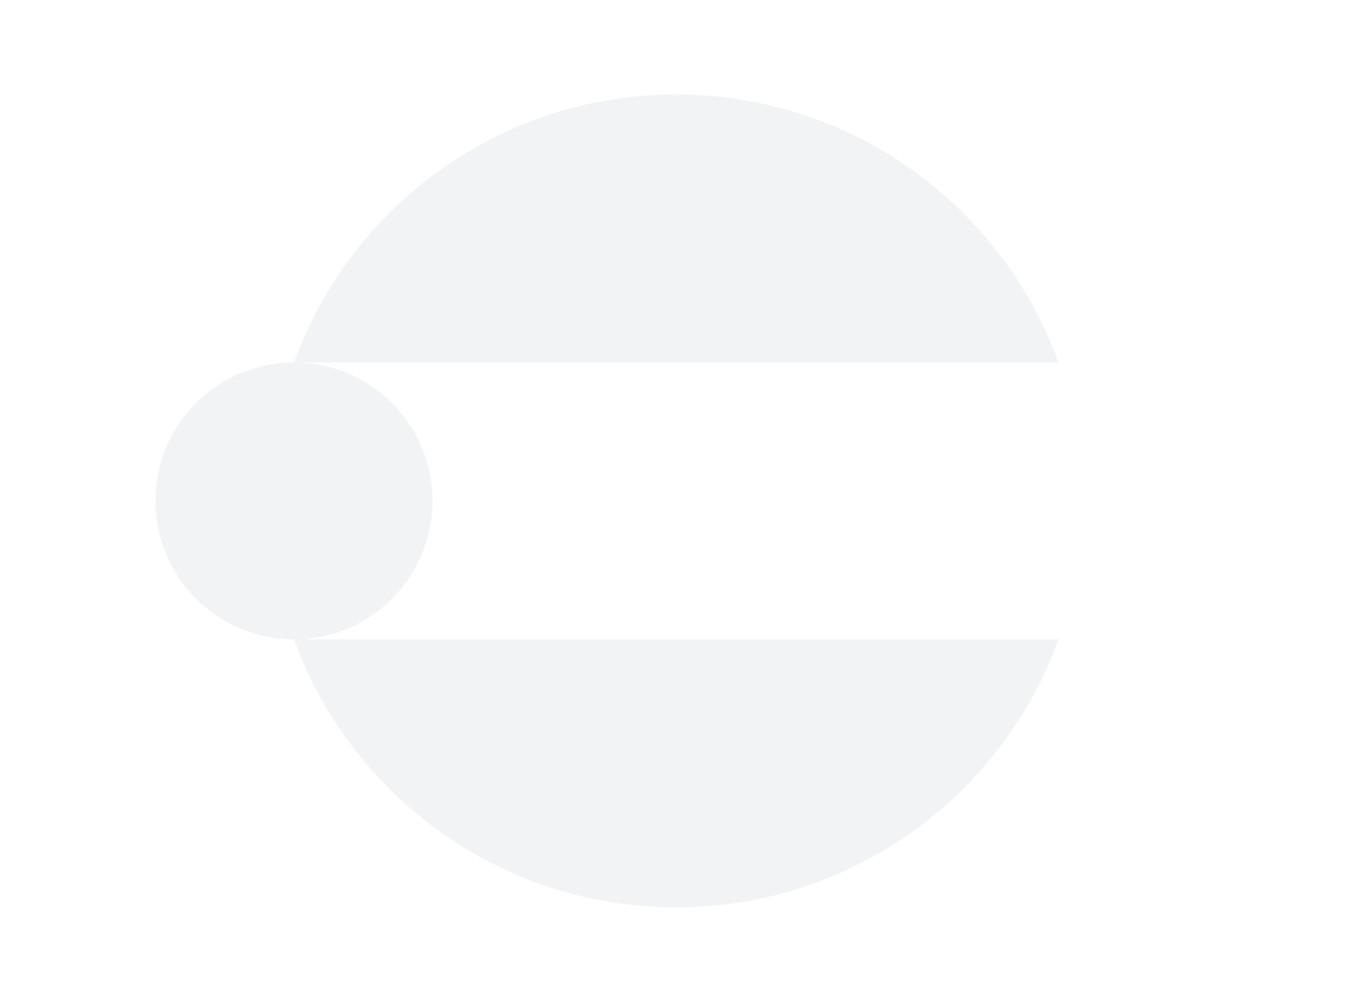 XAOC Devices Logo Shirt (Black) - XL